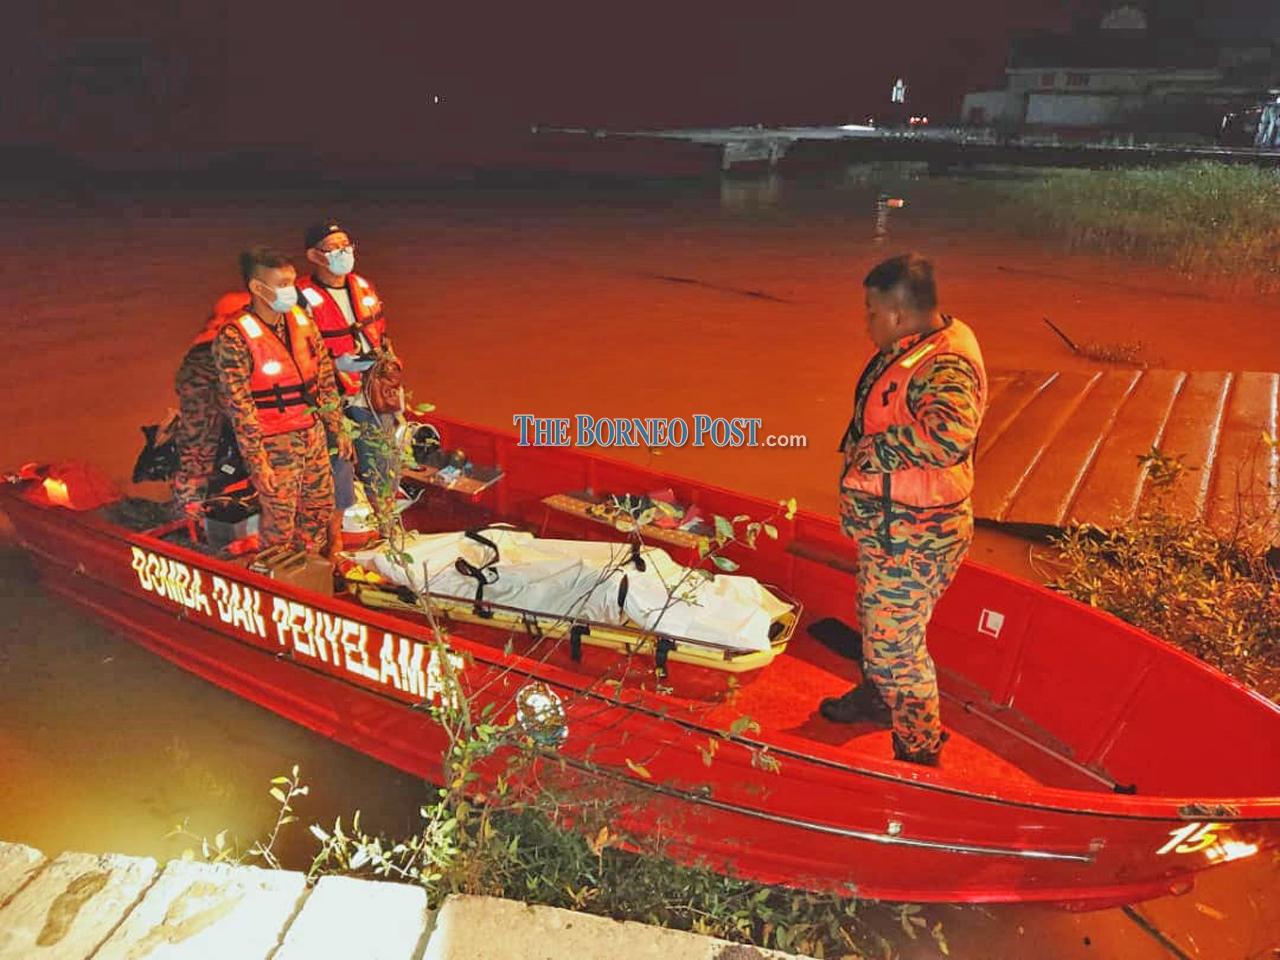 Missing capsized longboat passenger's body found